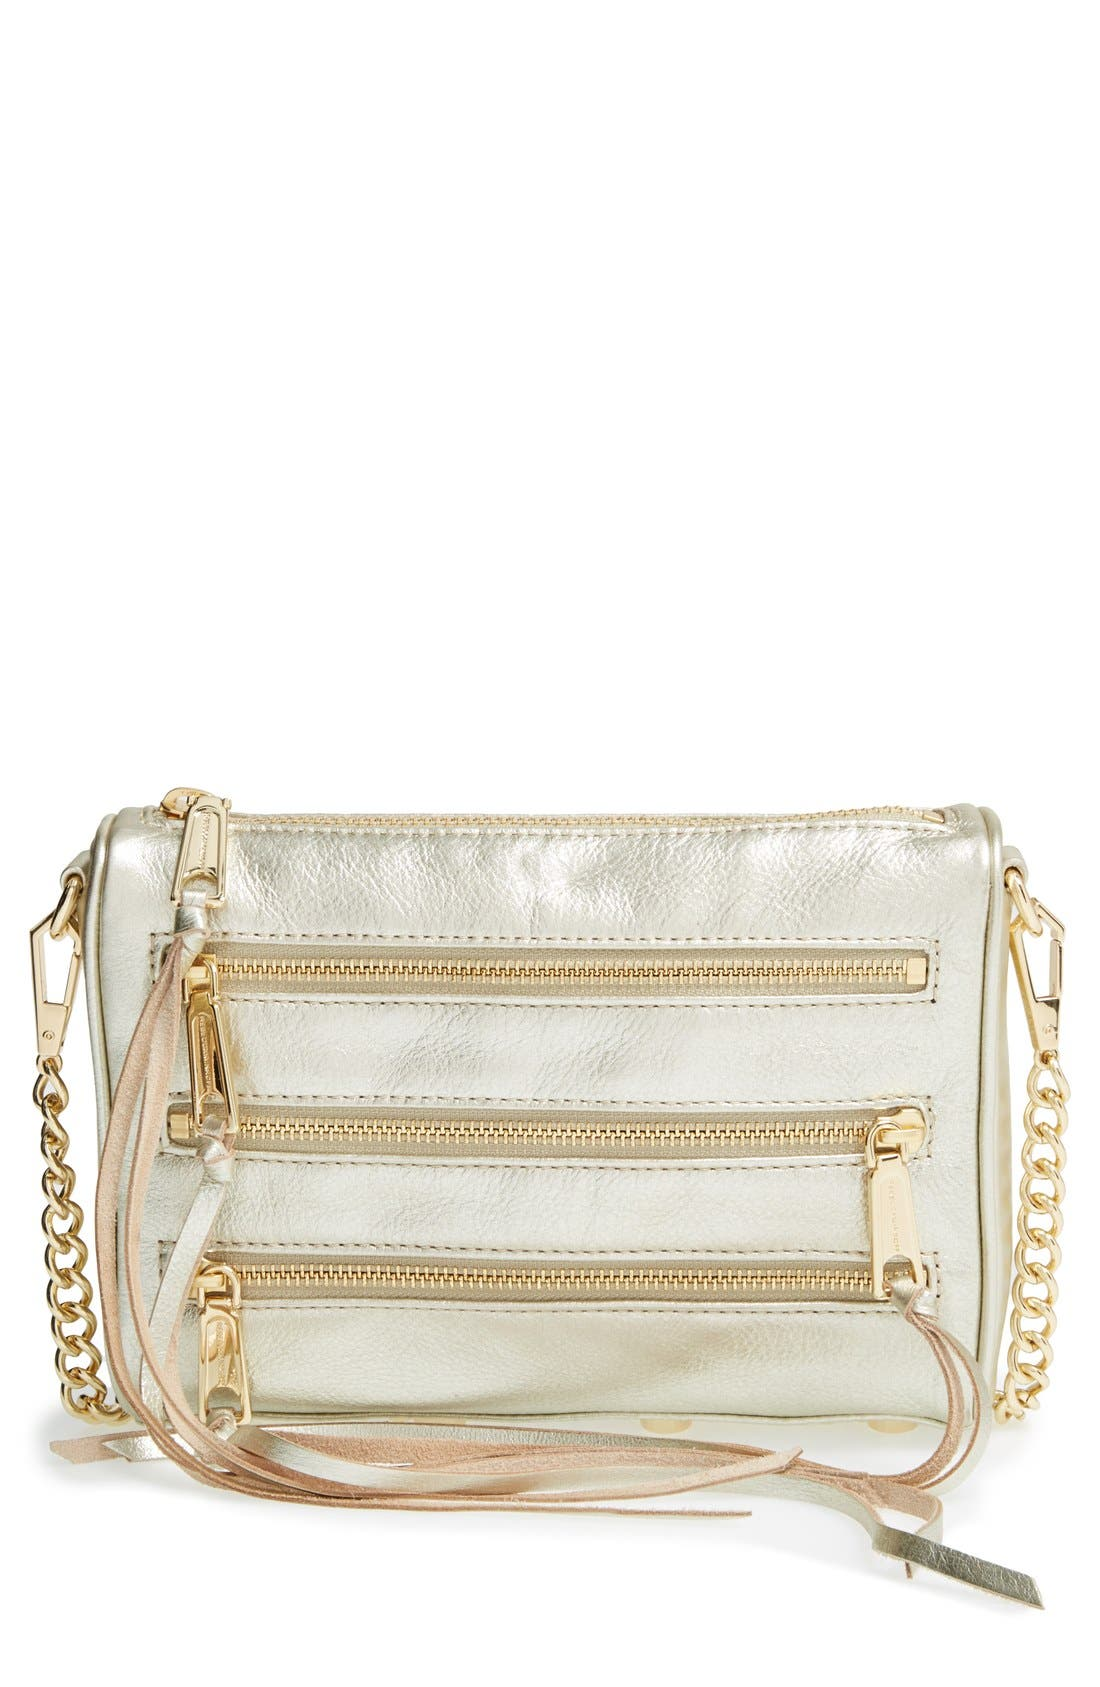 Alternate Image 1 Selected - Rebecca Minkoff 'Mini 5 Zip' Crossbody Bag